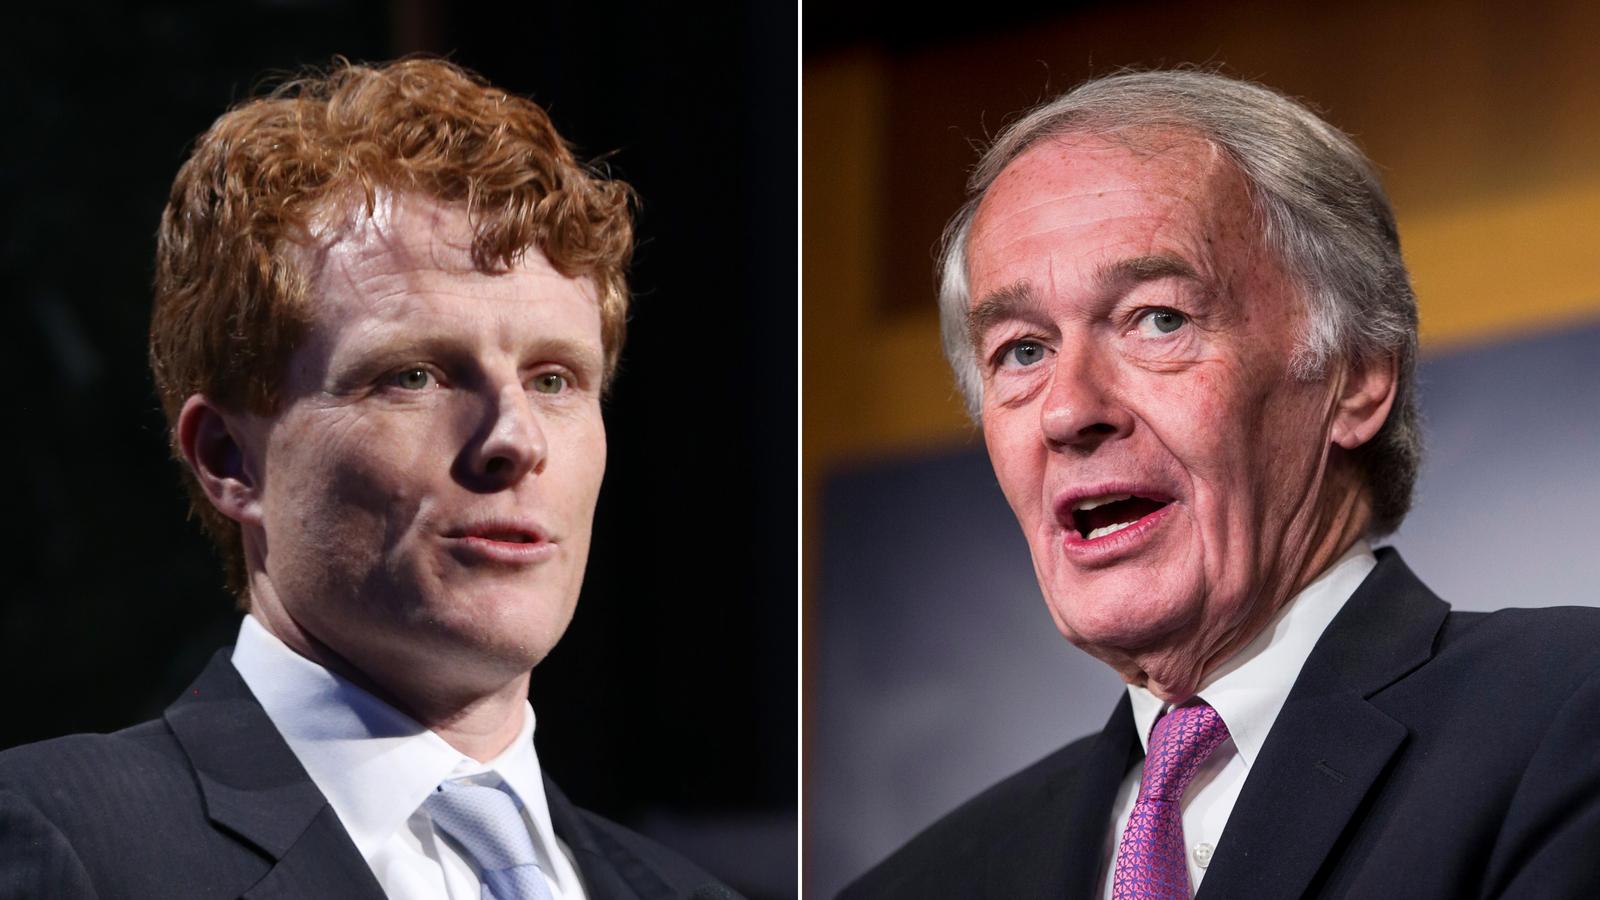 Democrats Joe Kennedy and Ed Markey spar over how to best counter Trump in Massachusetts Senate debate